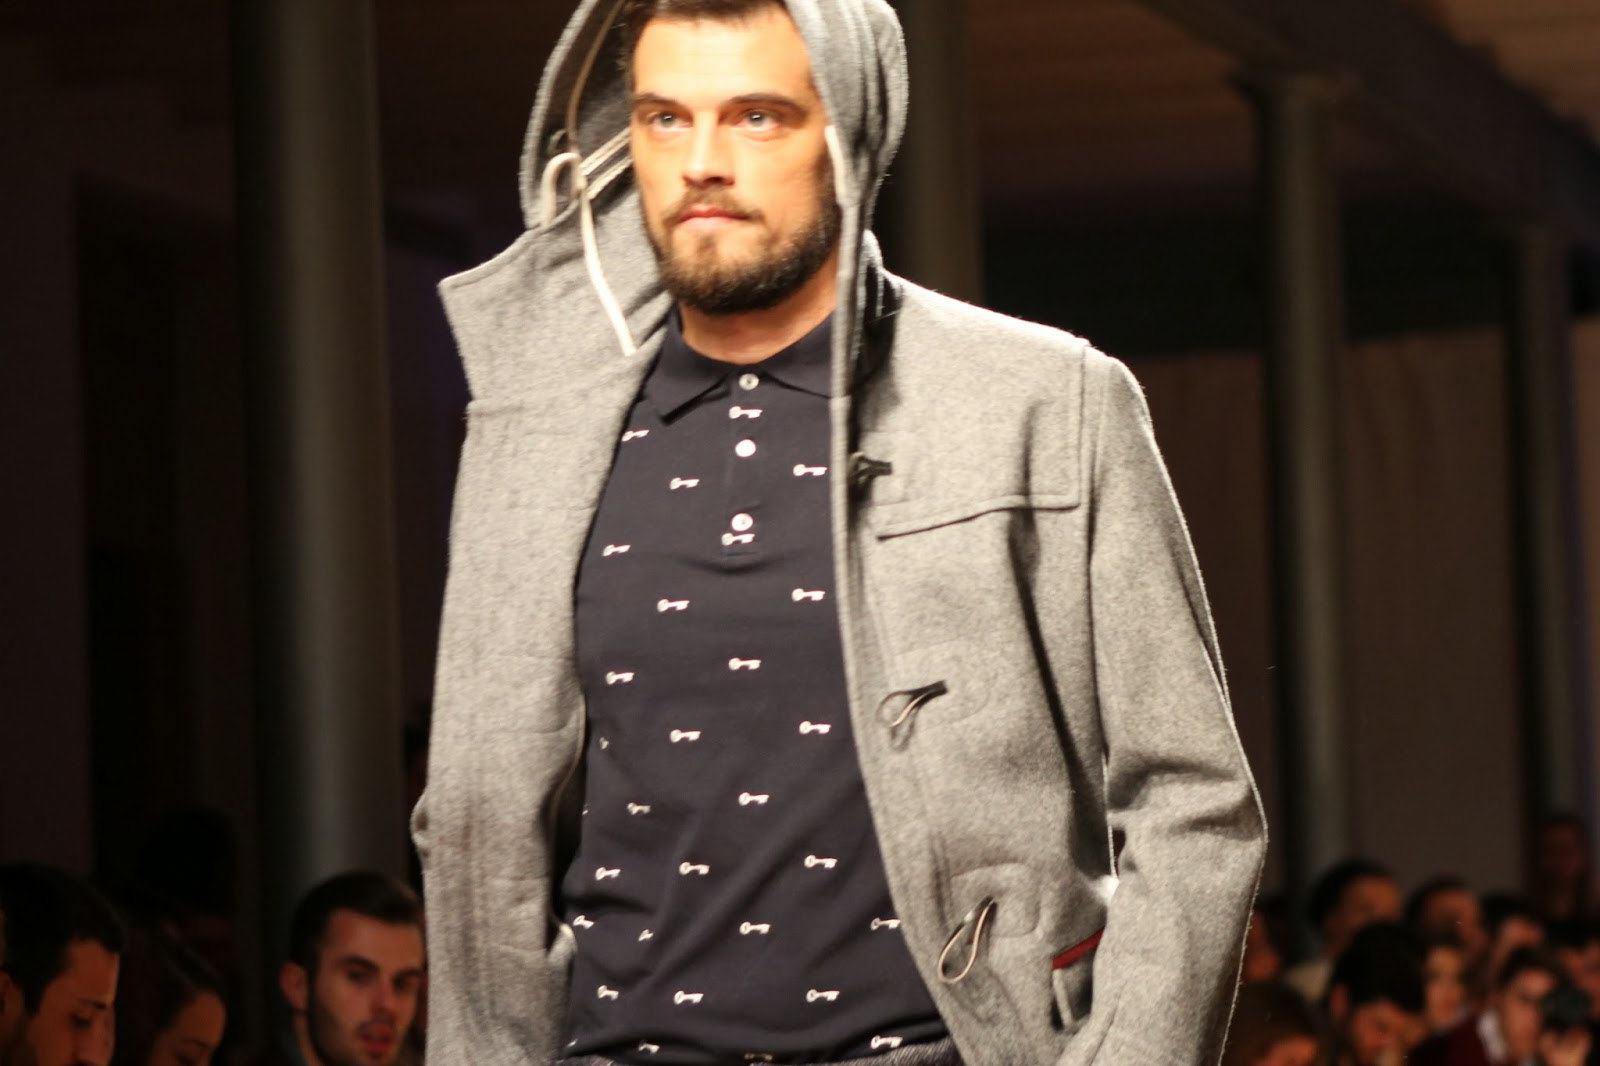 Tankey, estilo británico, moda española, street style, MFSHOW MEN